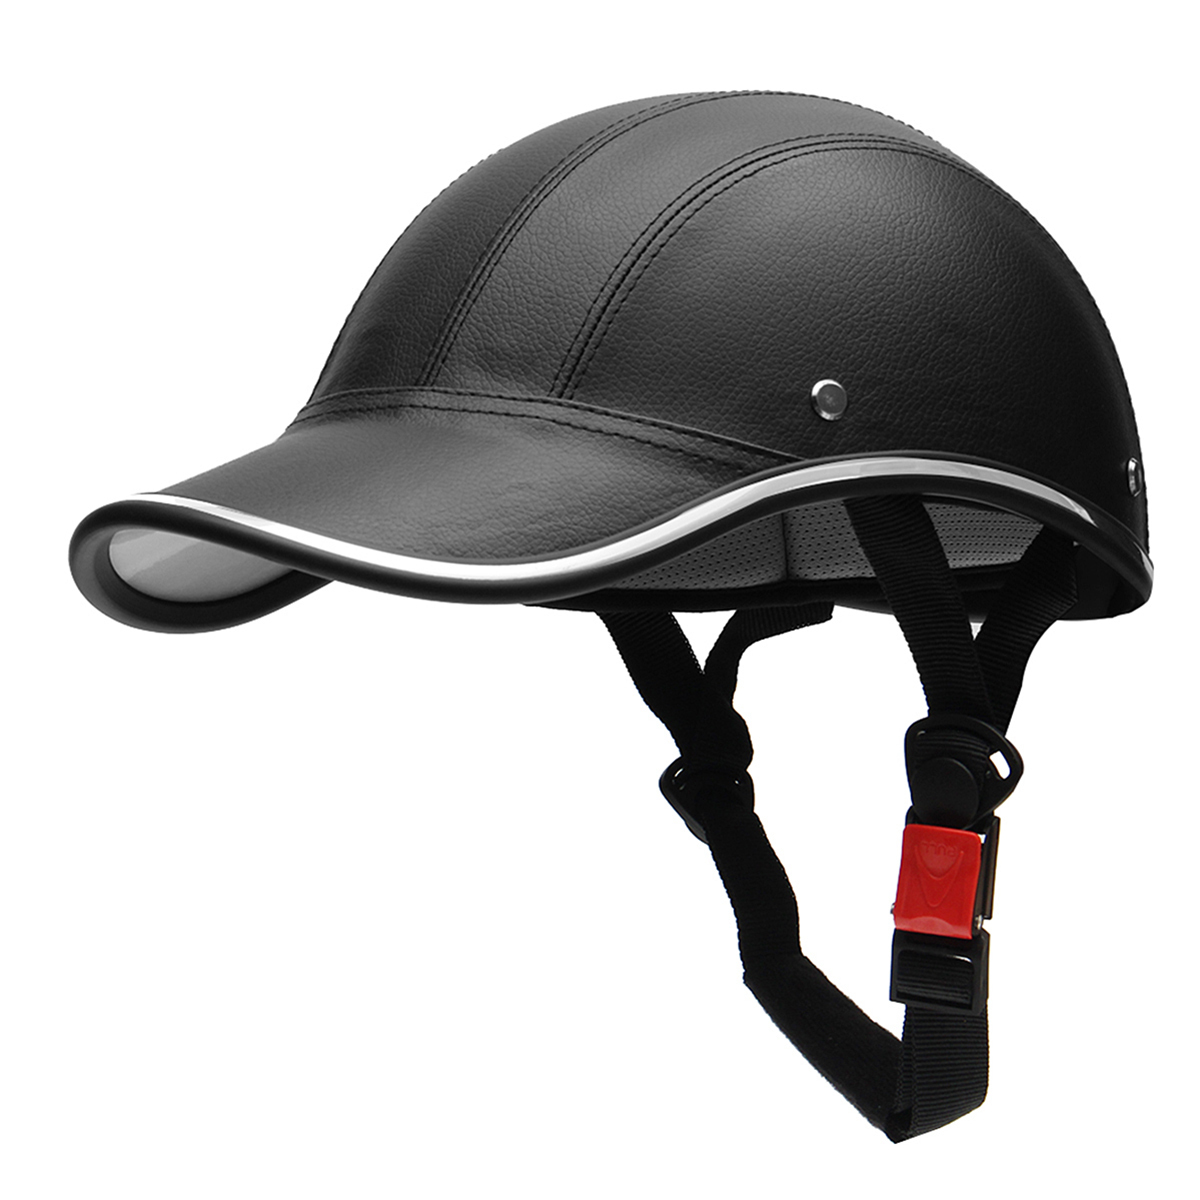 Motorcycle Half Helmet Baseball Cap Half Face Helm Electric Bike Roller Anti-UV Safety Hard Hat Motorbike 55-62cm